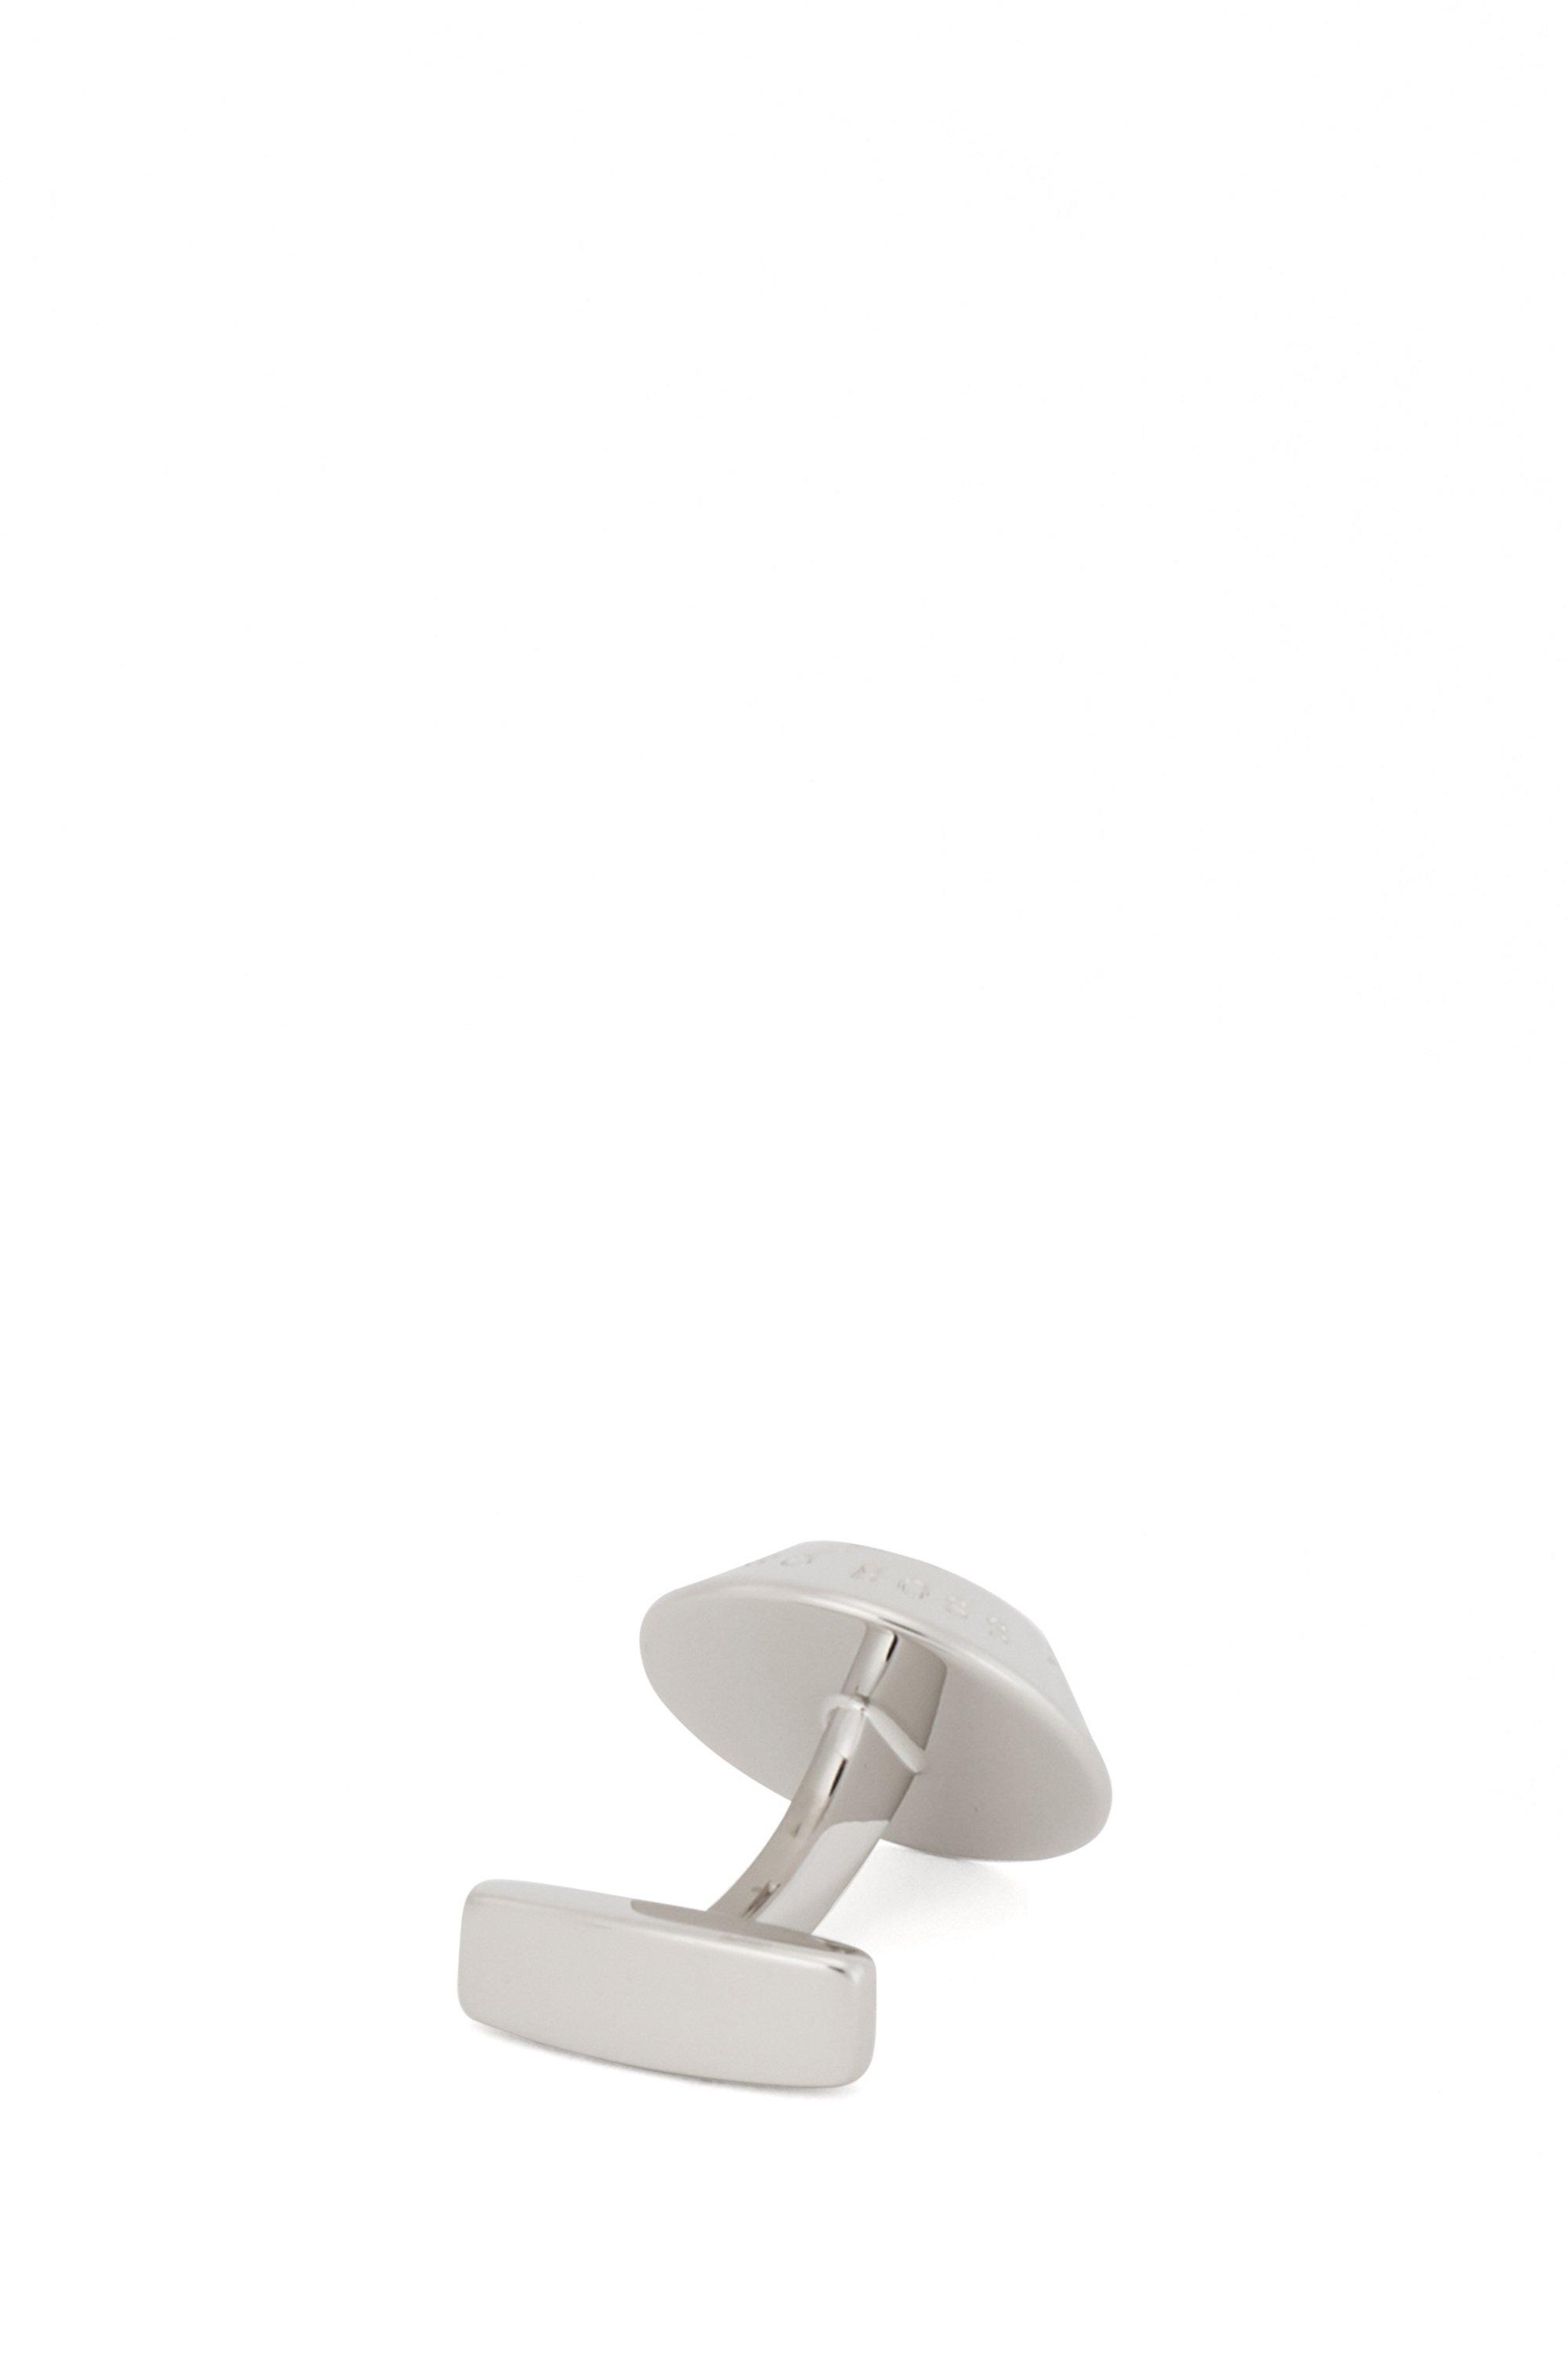 Conical brass cufflinks with patterned enamel insert